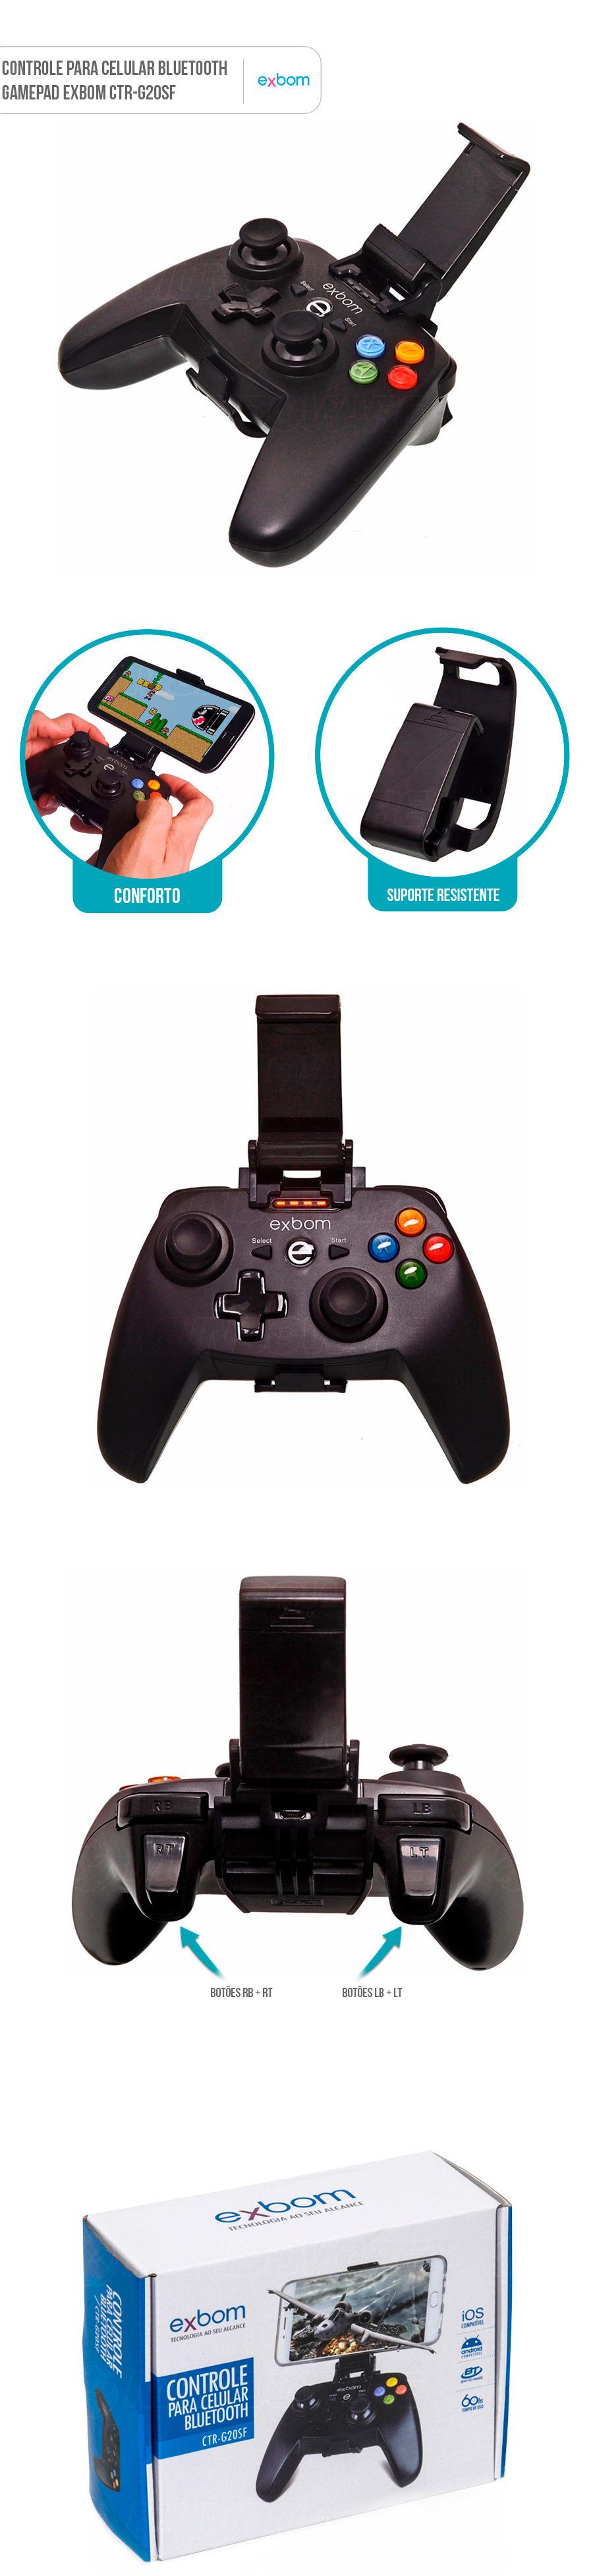 Controle para Smartphone Bluetooth Gamepad